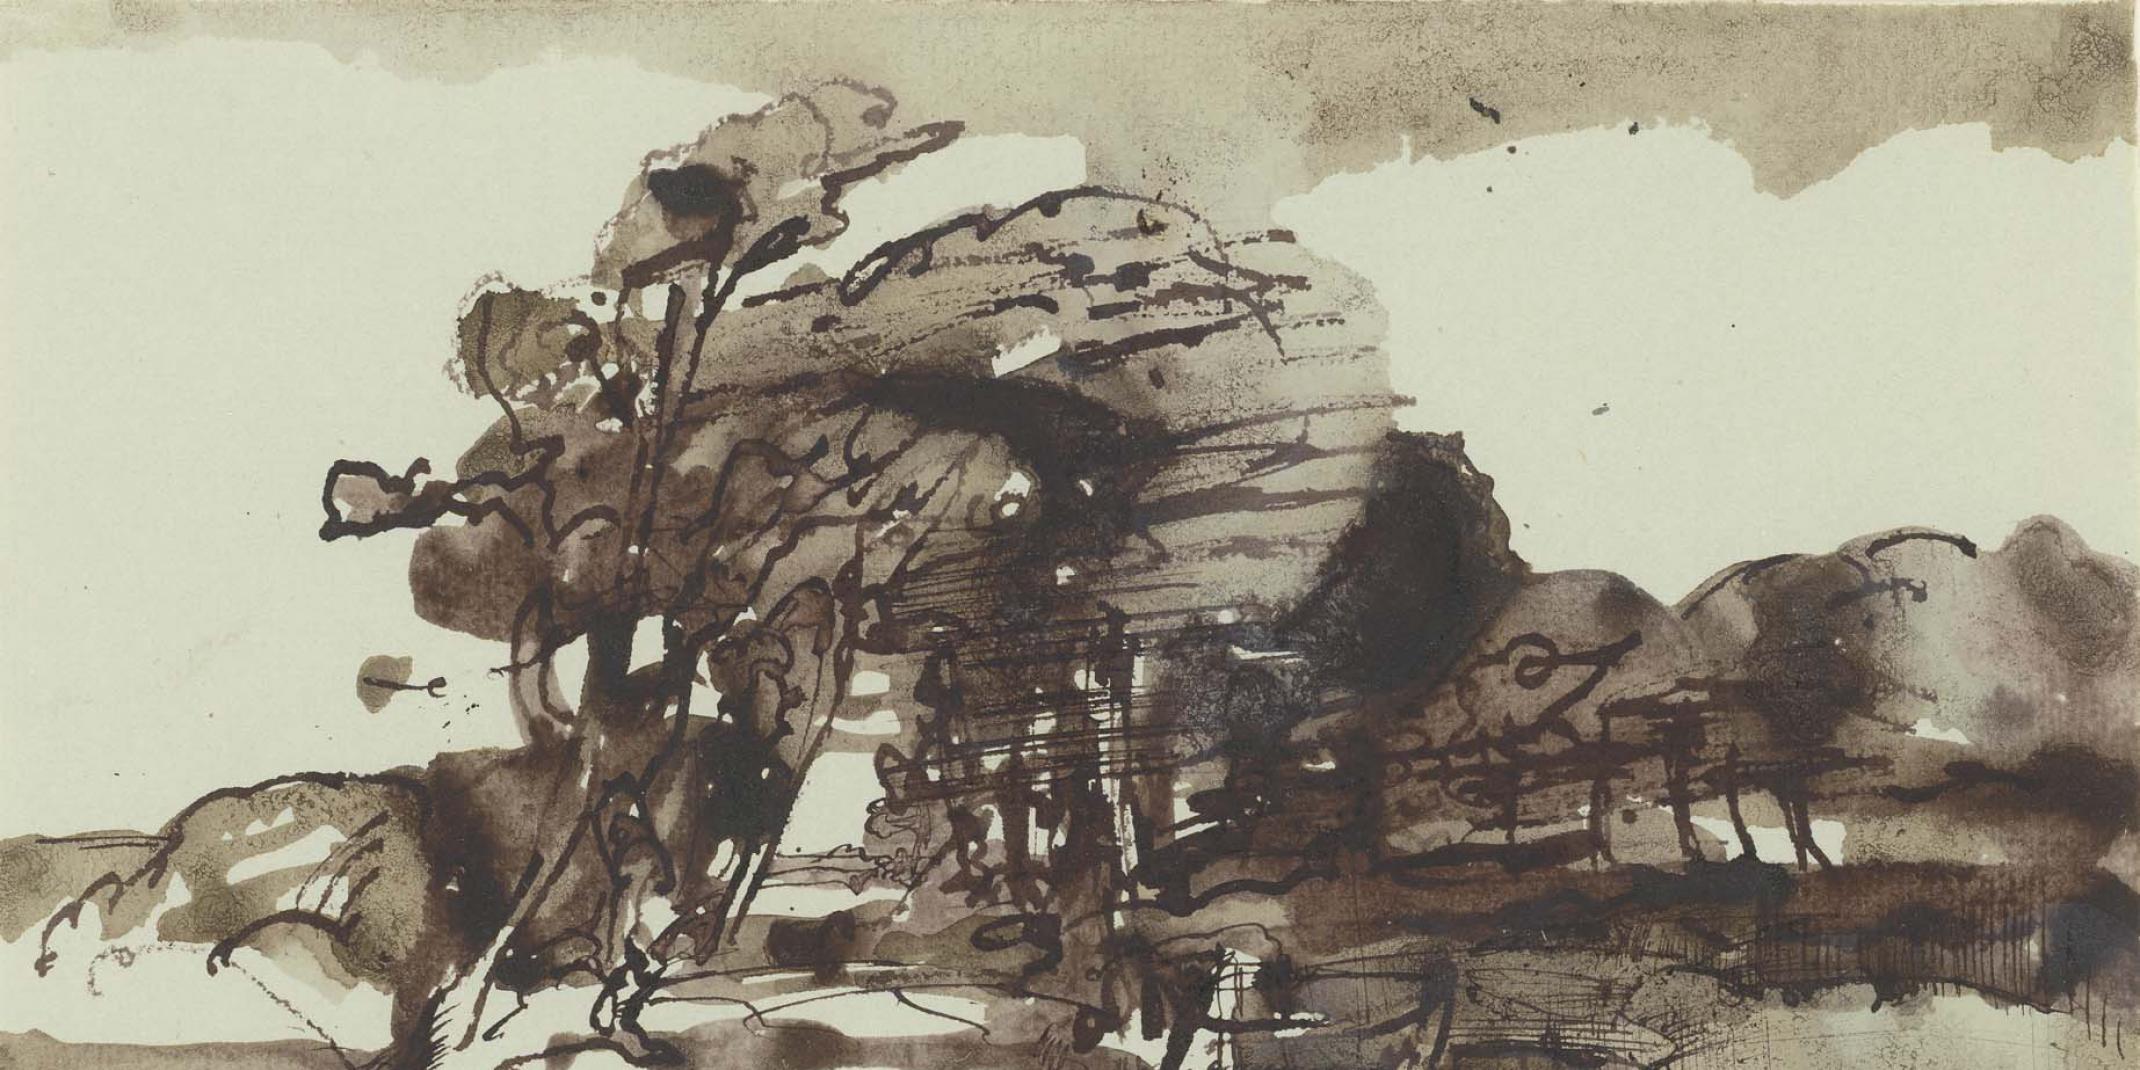 Horst Janssen (1929–1995), Landschaft in Holstein – Hommage à Claude Lorrain, 4. August 1972, Hamburger Kunsthalle, Kupferstich-kabinett, Legat Gerhard Schack, 2007 © VG Bild-Kunst, Bonn 2017 Foto: Christoph Irrgang